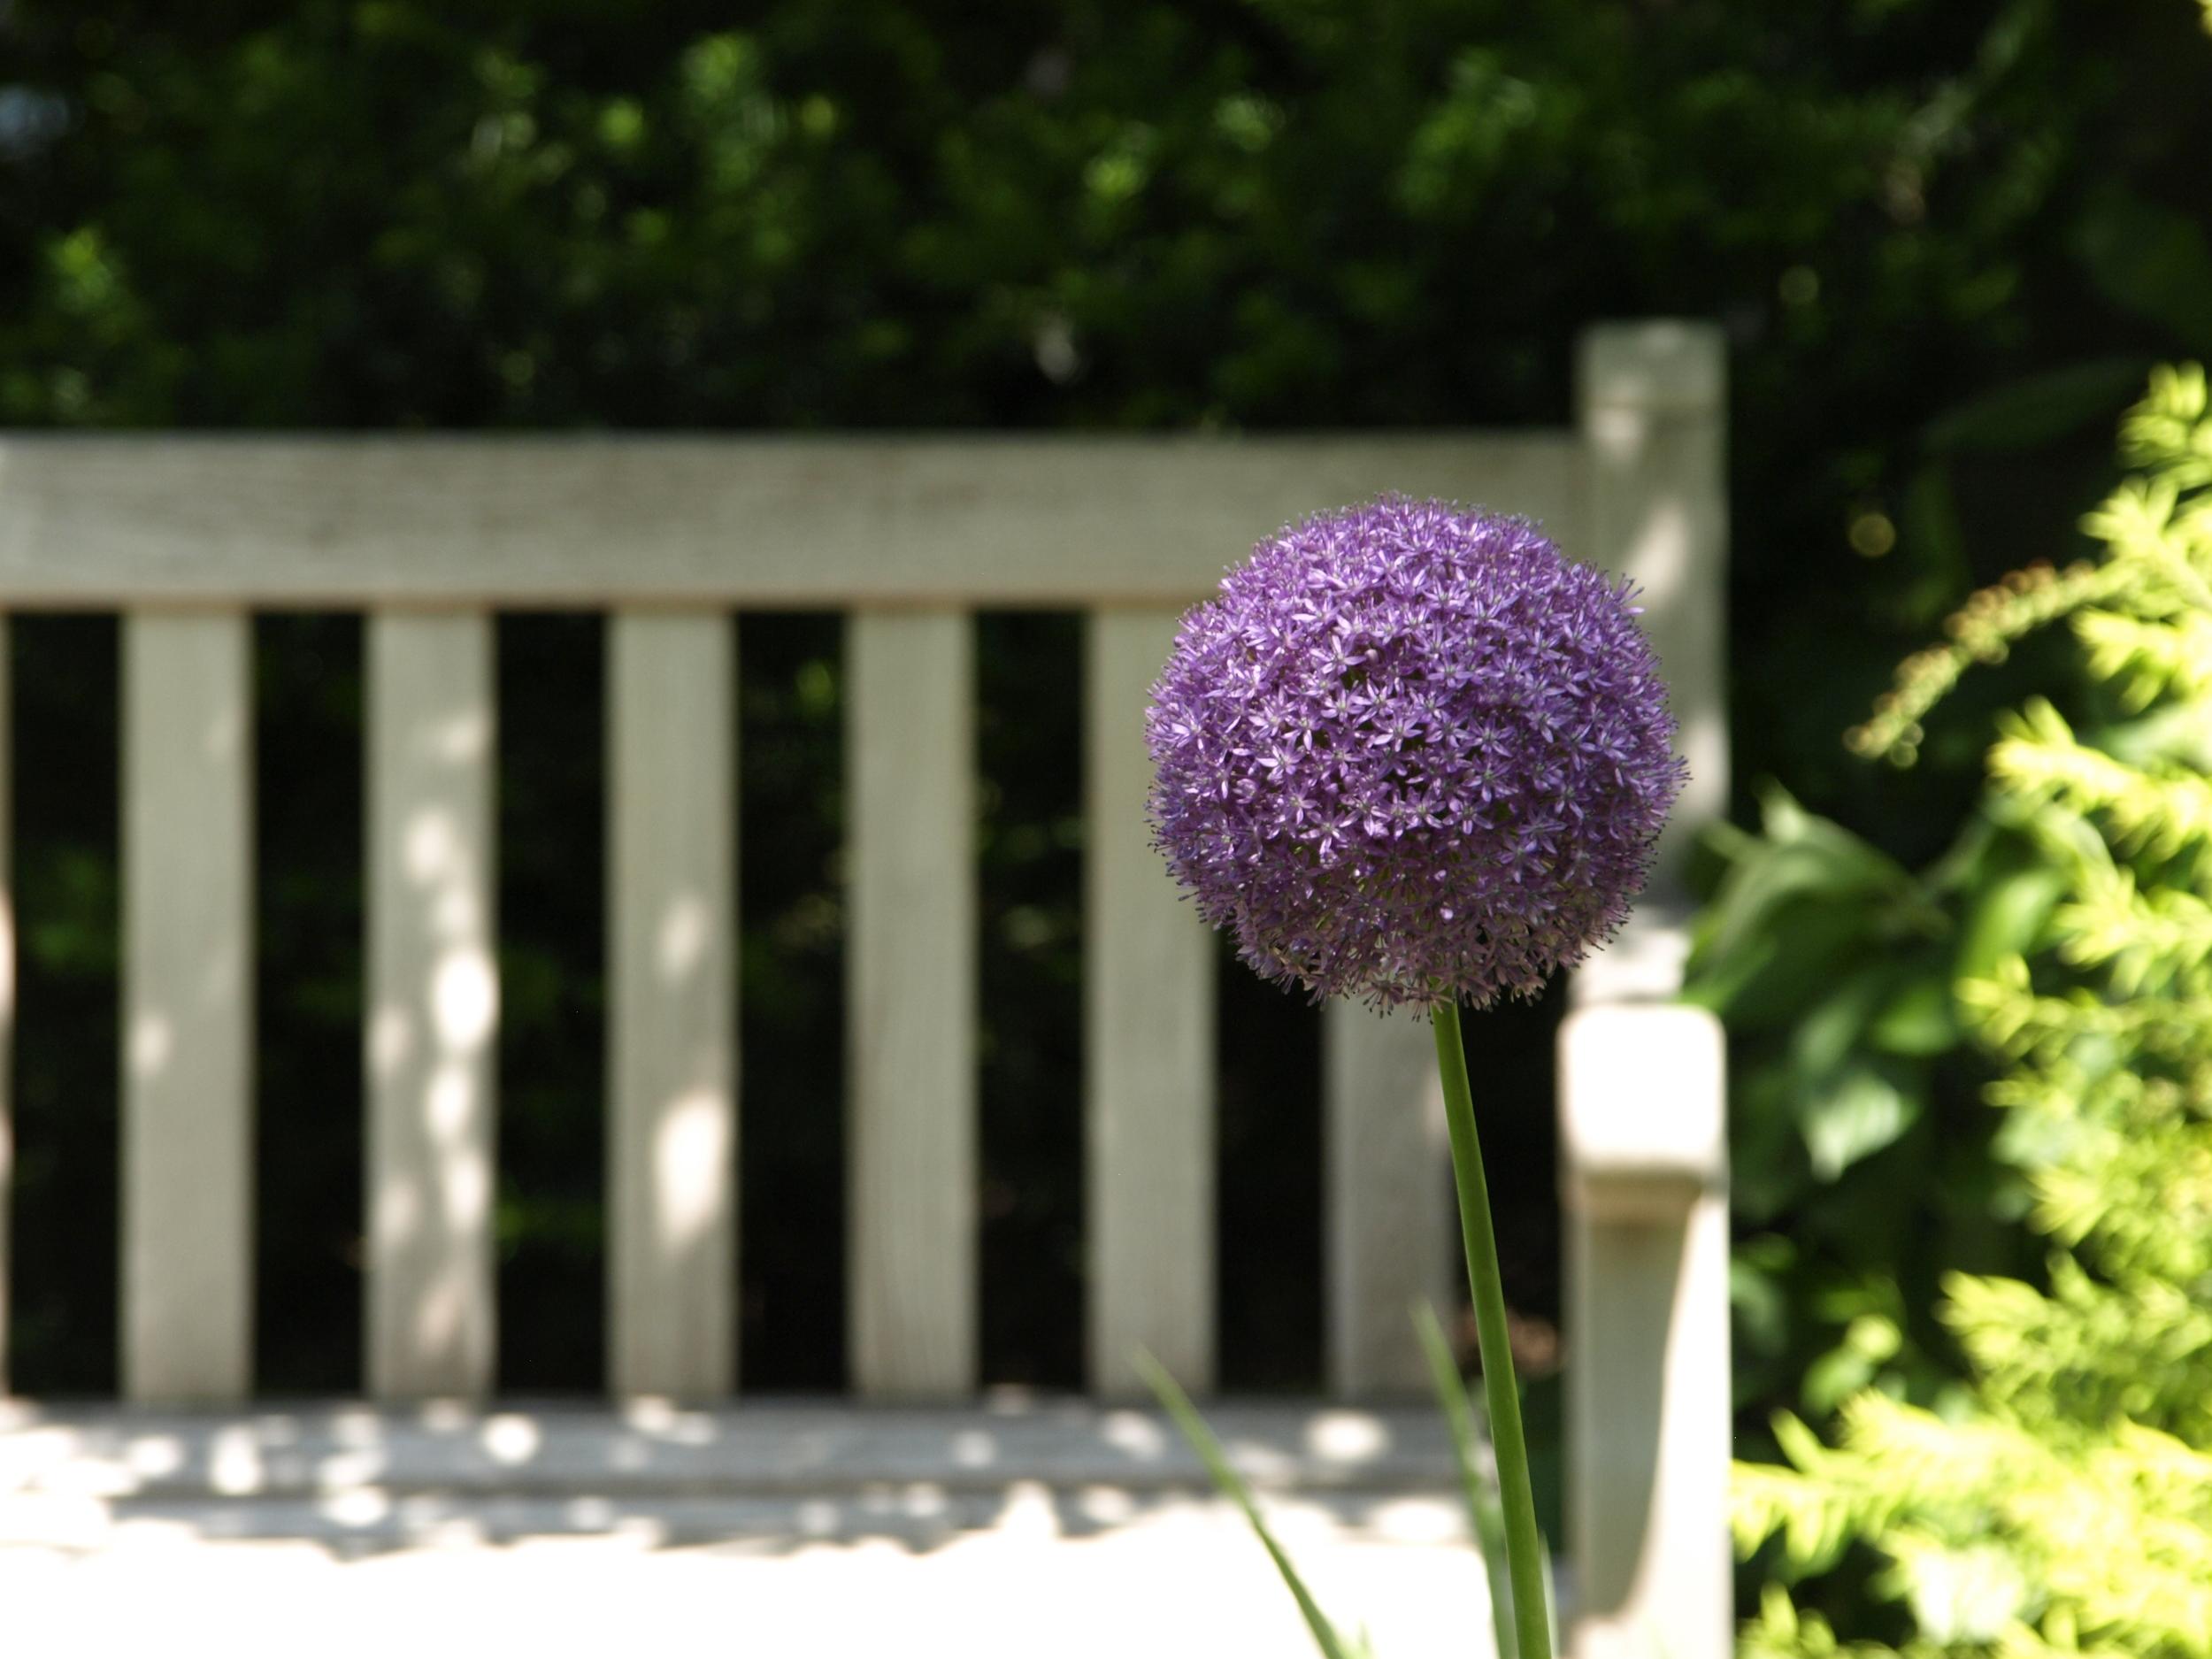 flower-in-front-of-bench.jpg